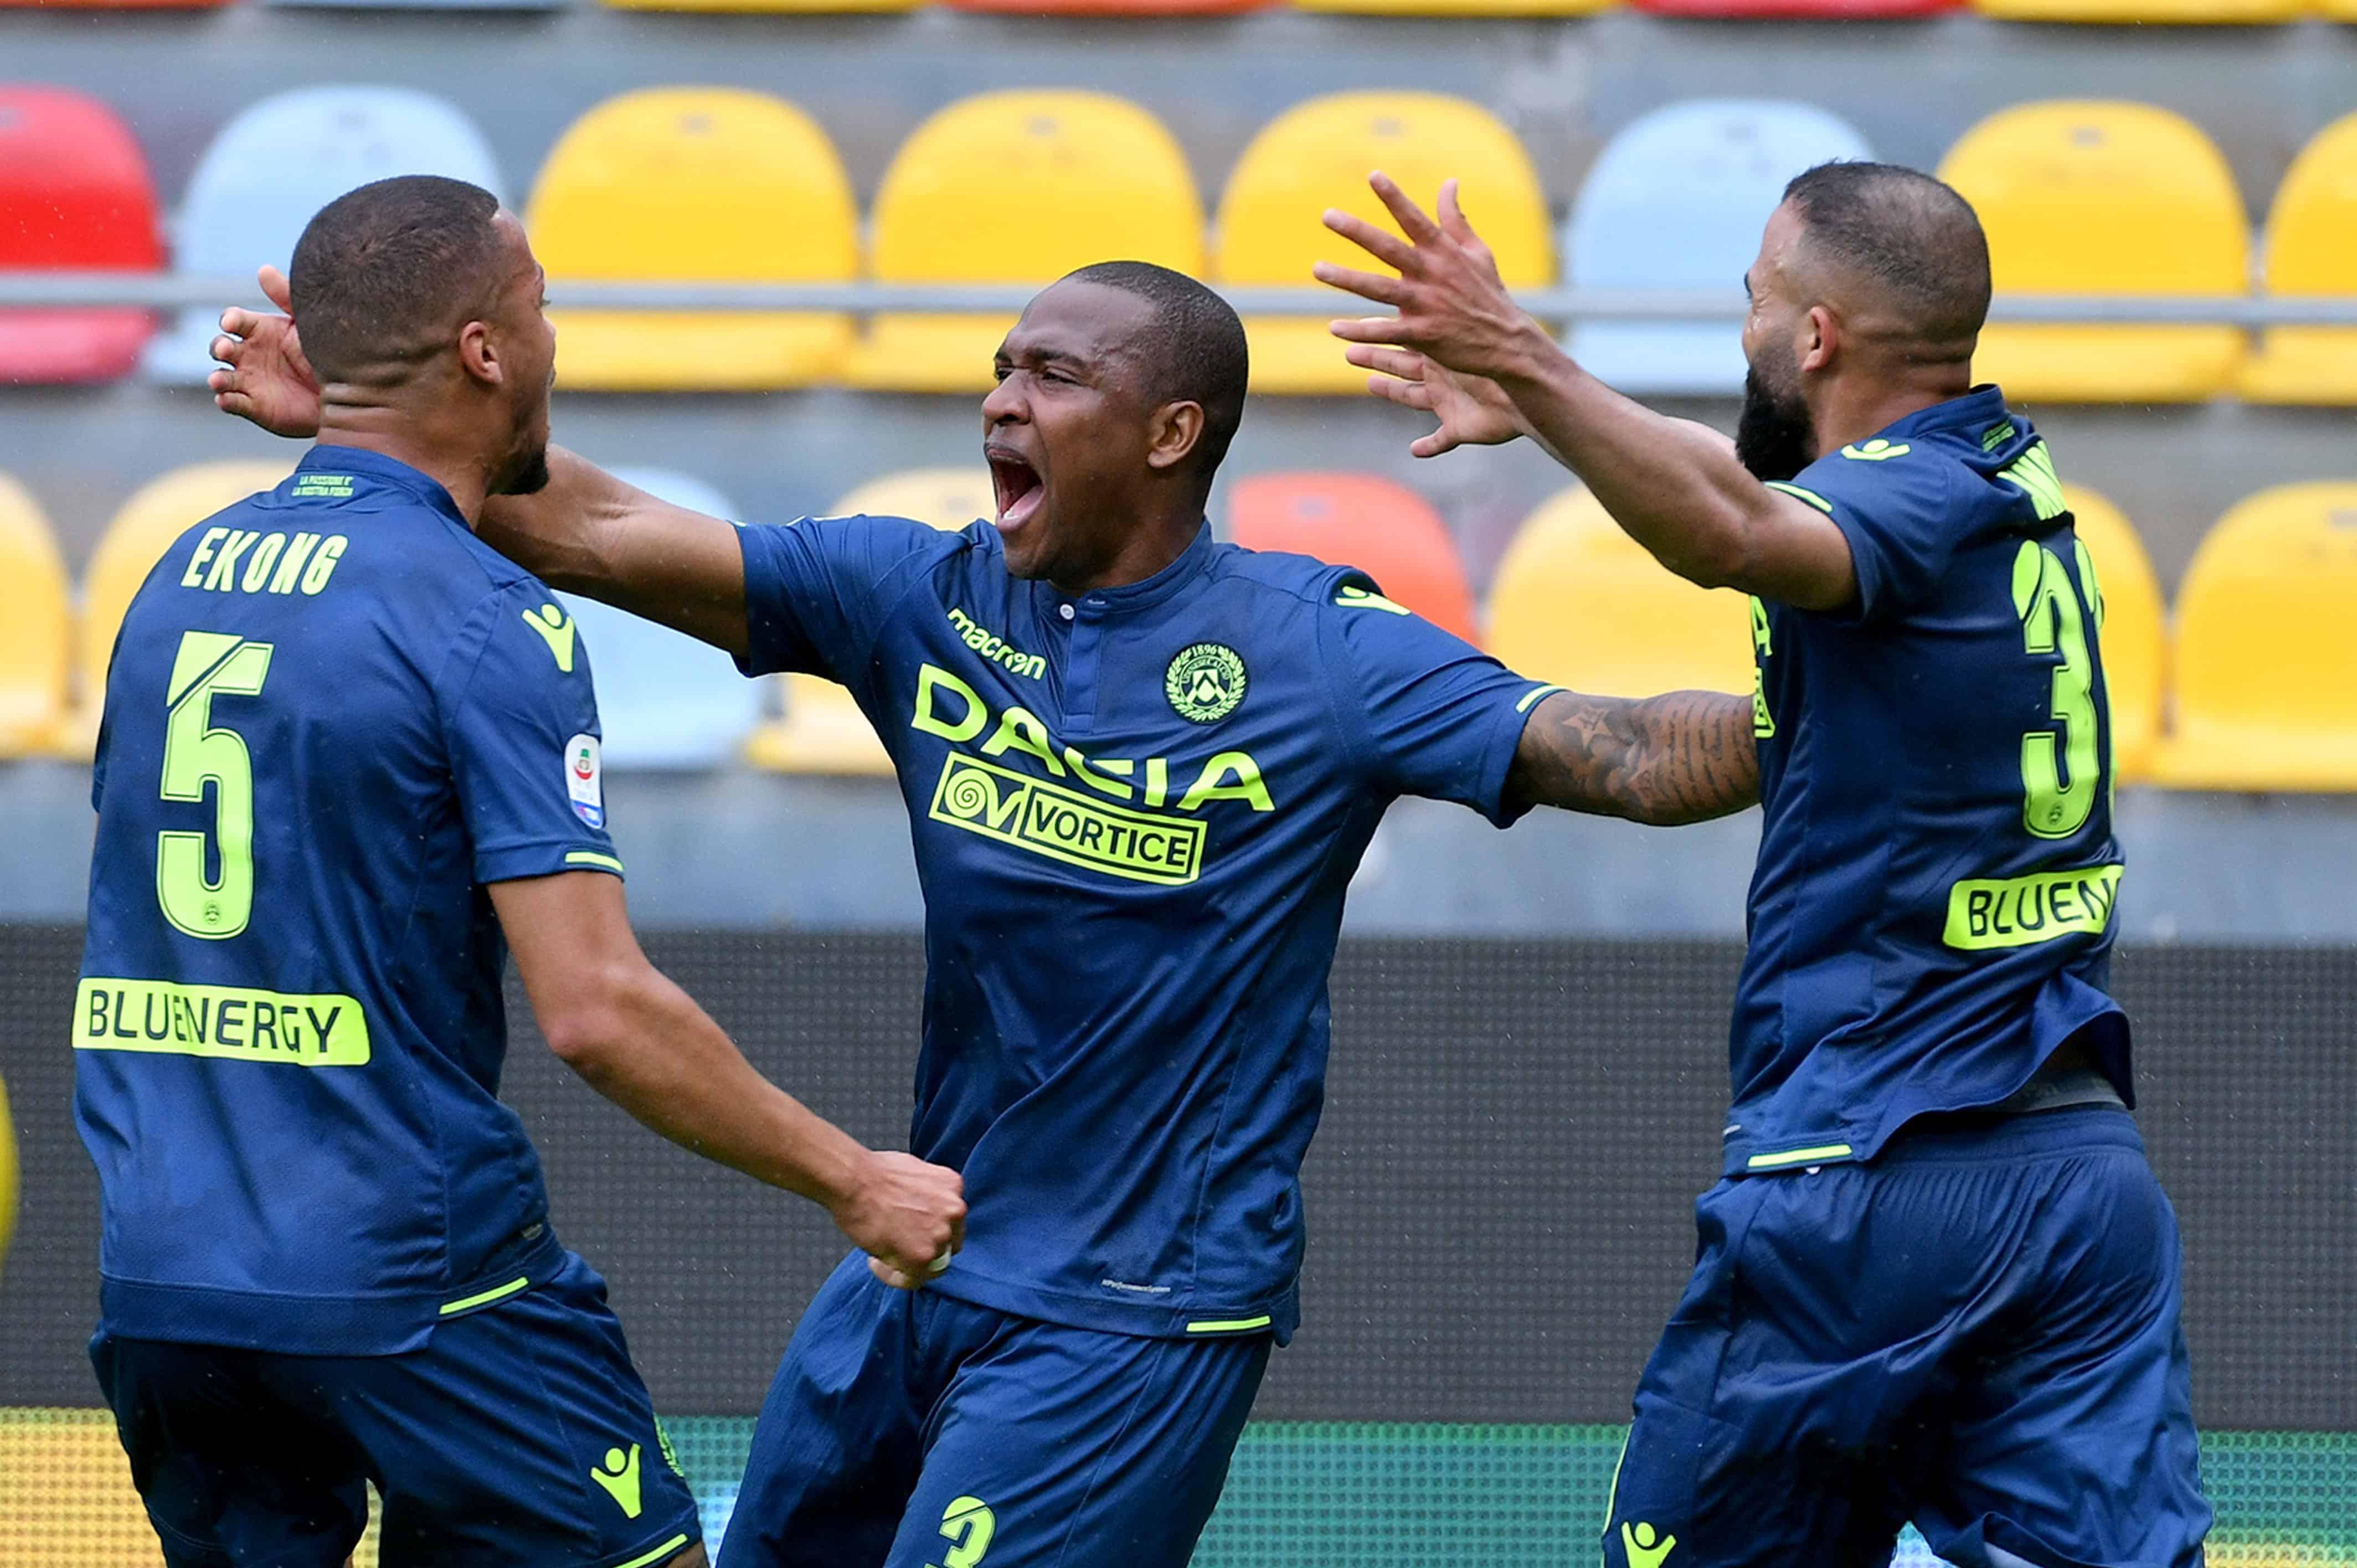 Frosinone Calcio v Udinese - Serie A